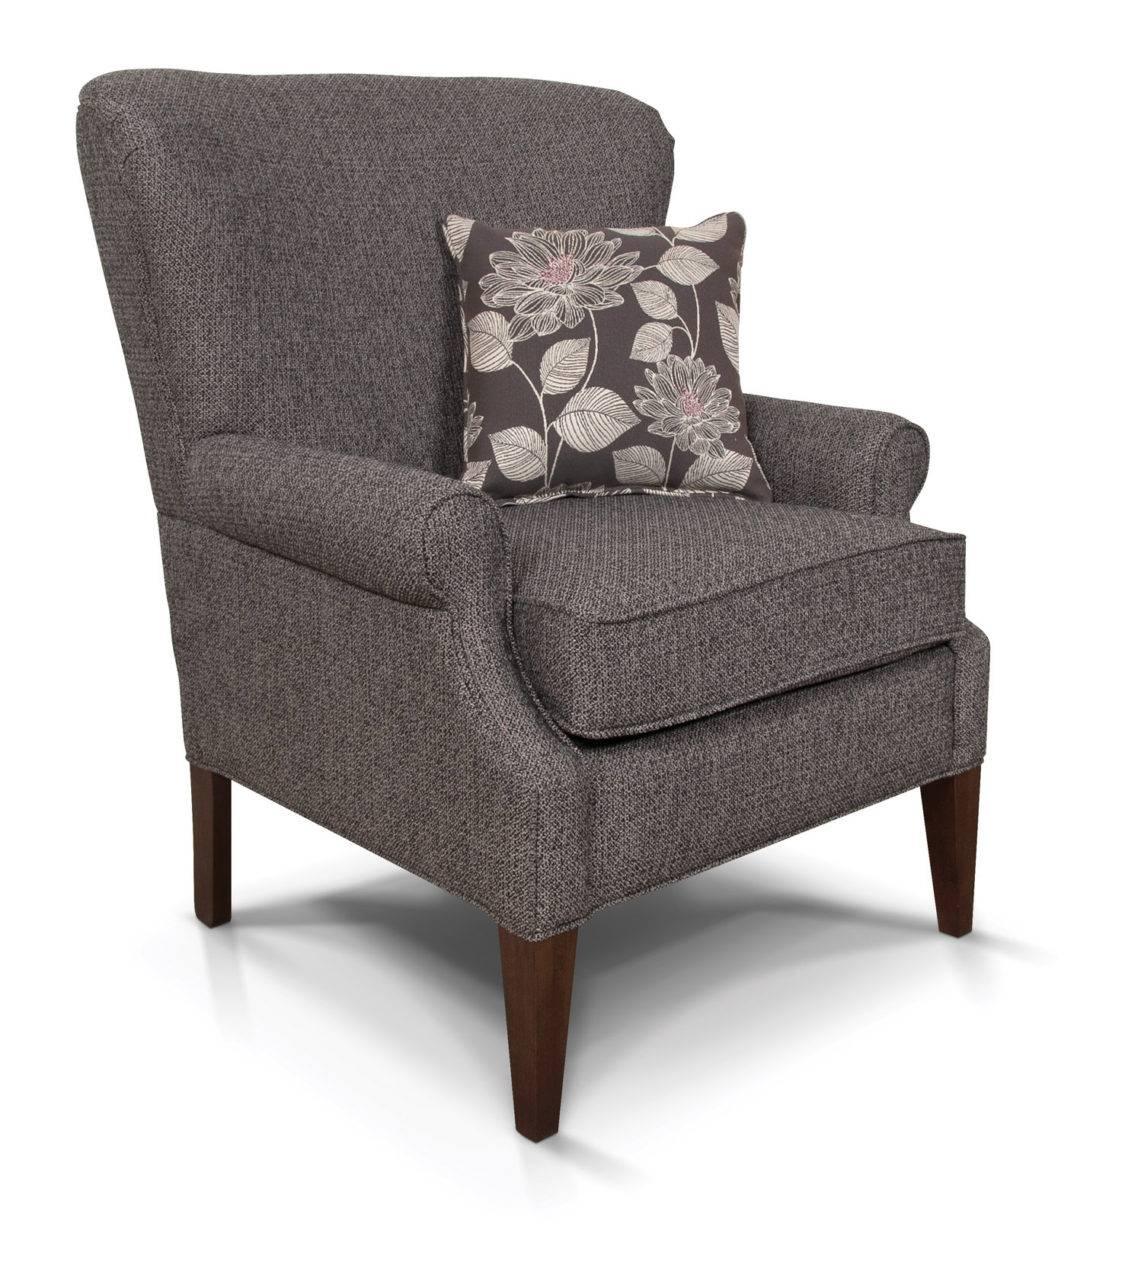 Popular Photo of Sofa Chairs